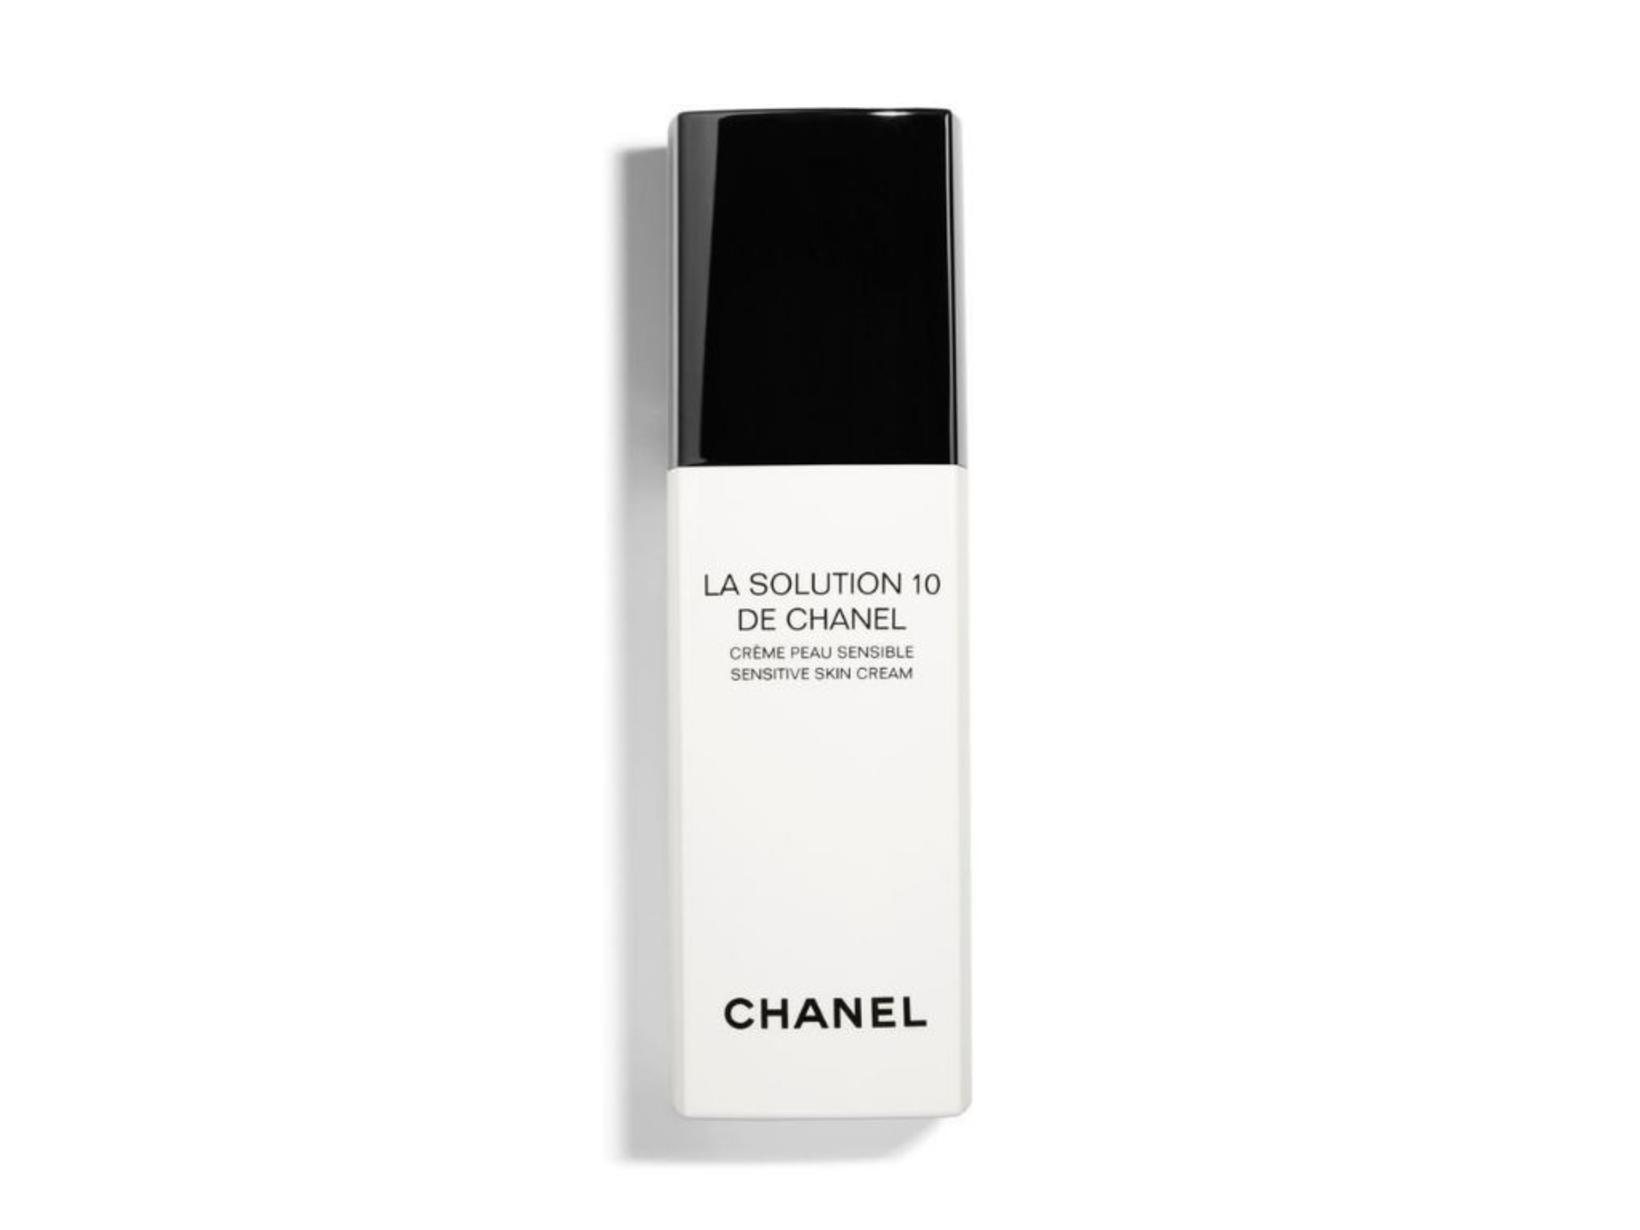 Chanel La Solution 10 De Chanel.